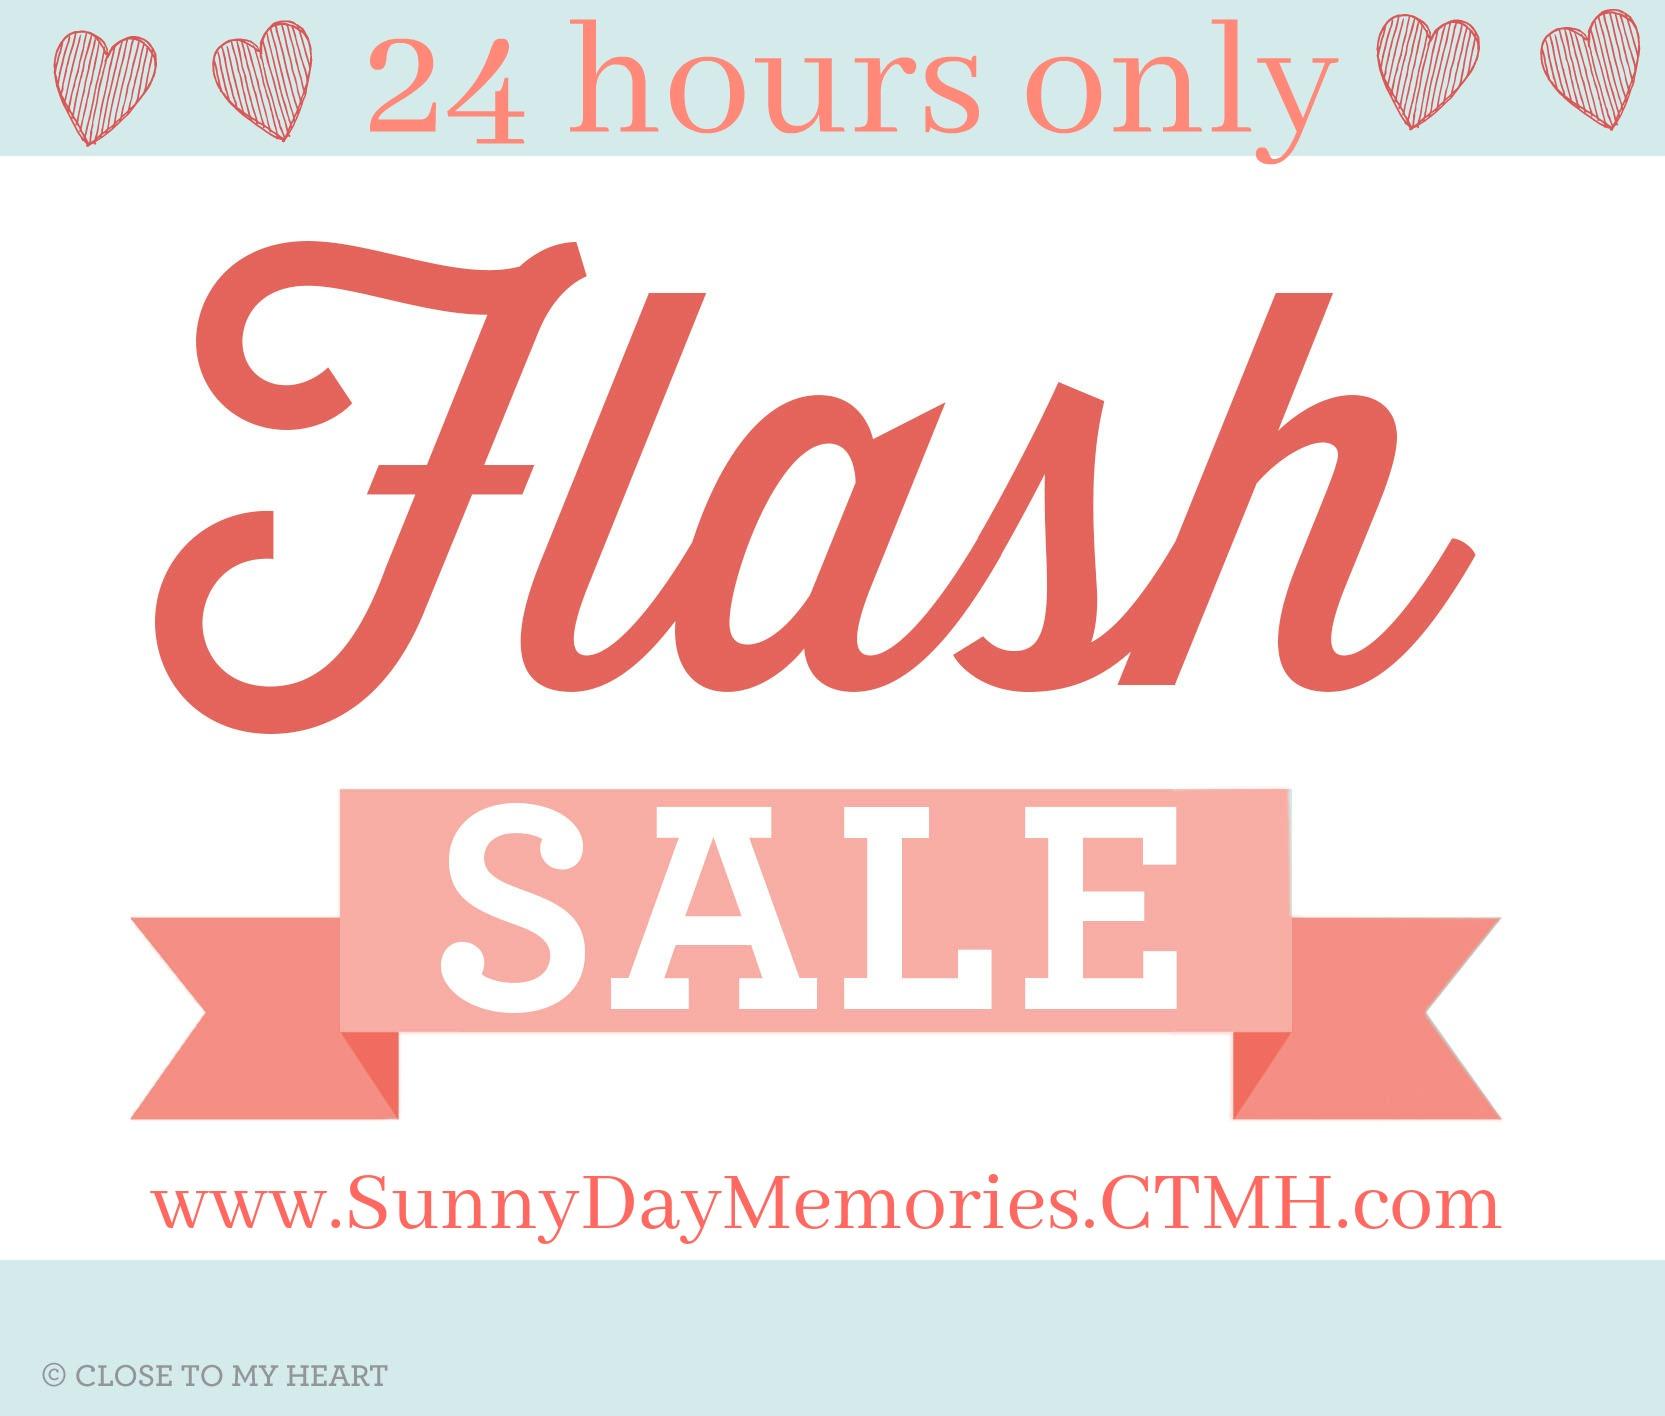 June 8 CTMH Flash Sale